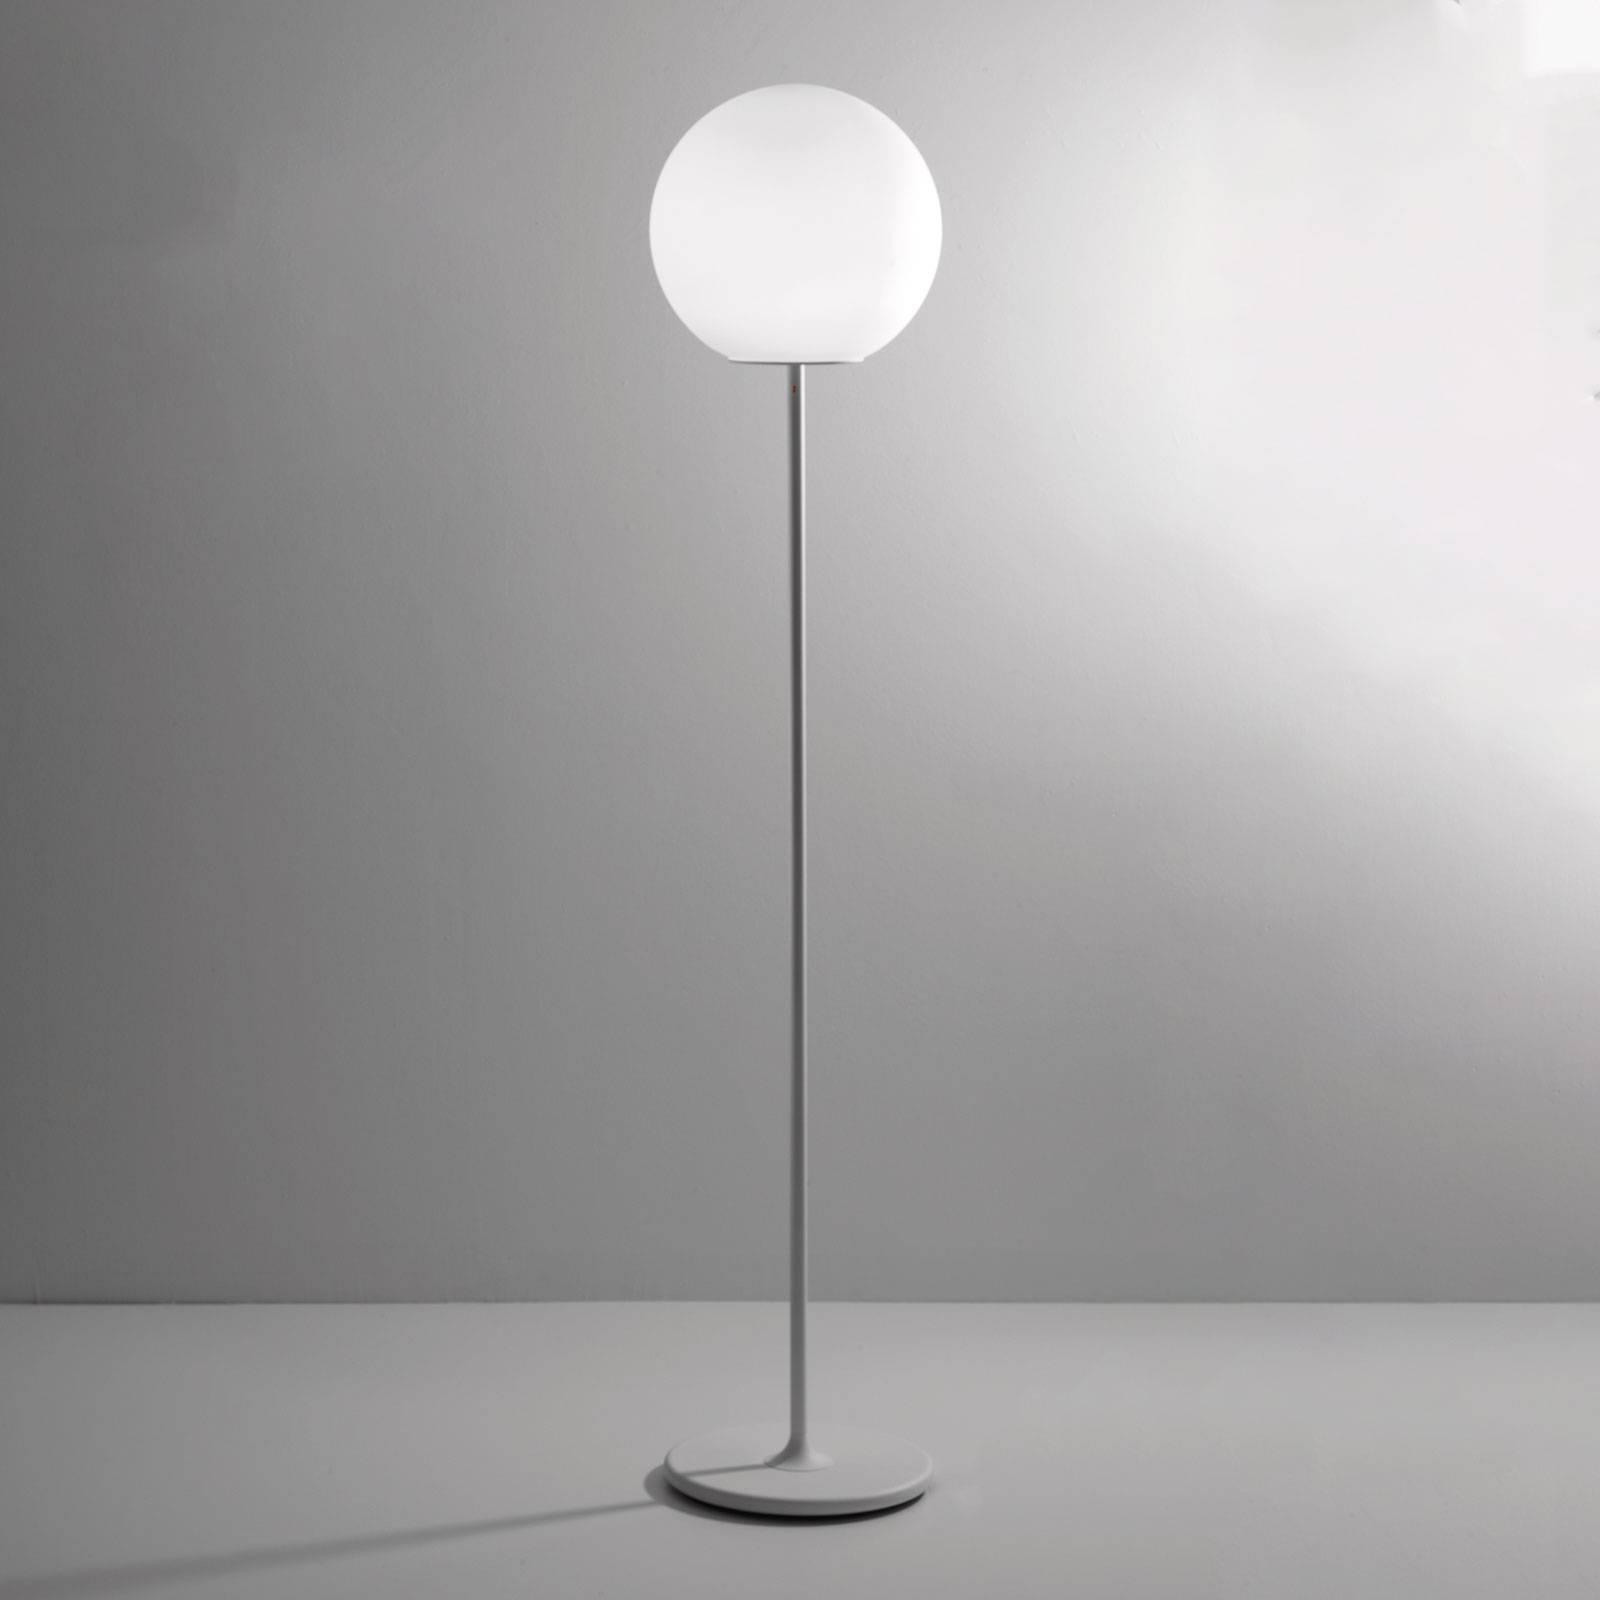 Fabbian Lumi Sfera glas-vloerlamp, Ø 35 cm